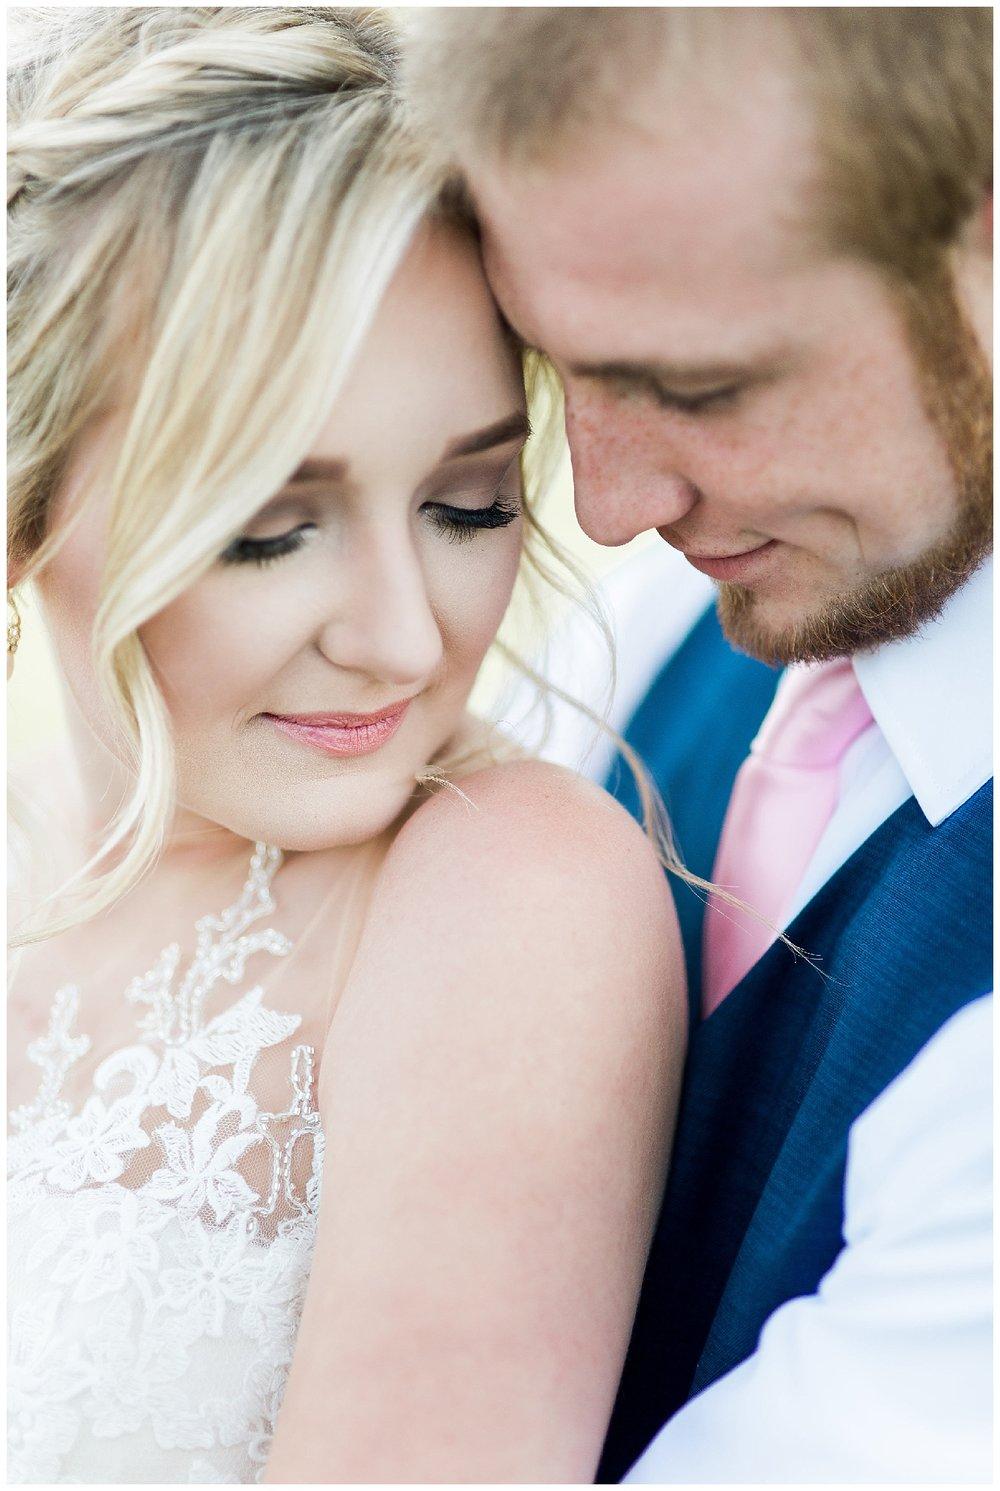 everleigh-photography-cincinnati-wedding-photographer-best-moments-of-2016-cincinnati-wedding-cincinnati-weddings-38